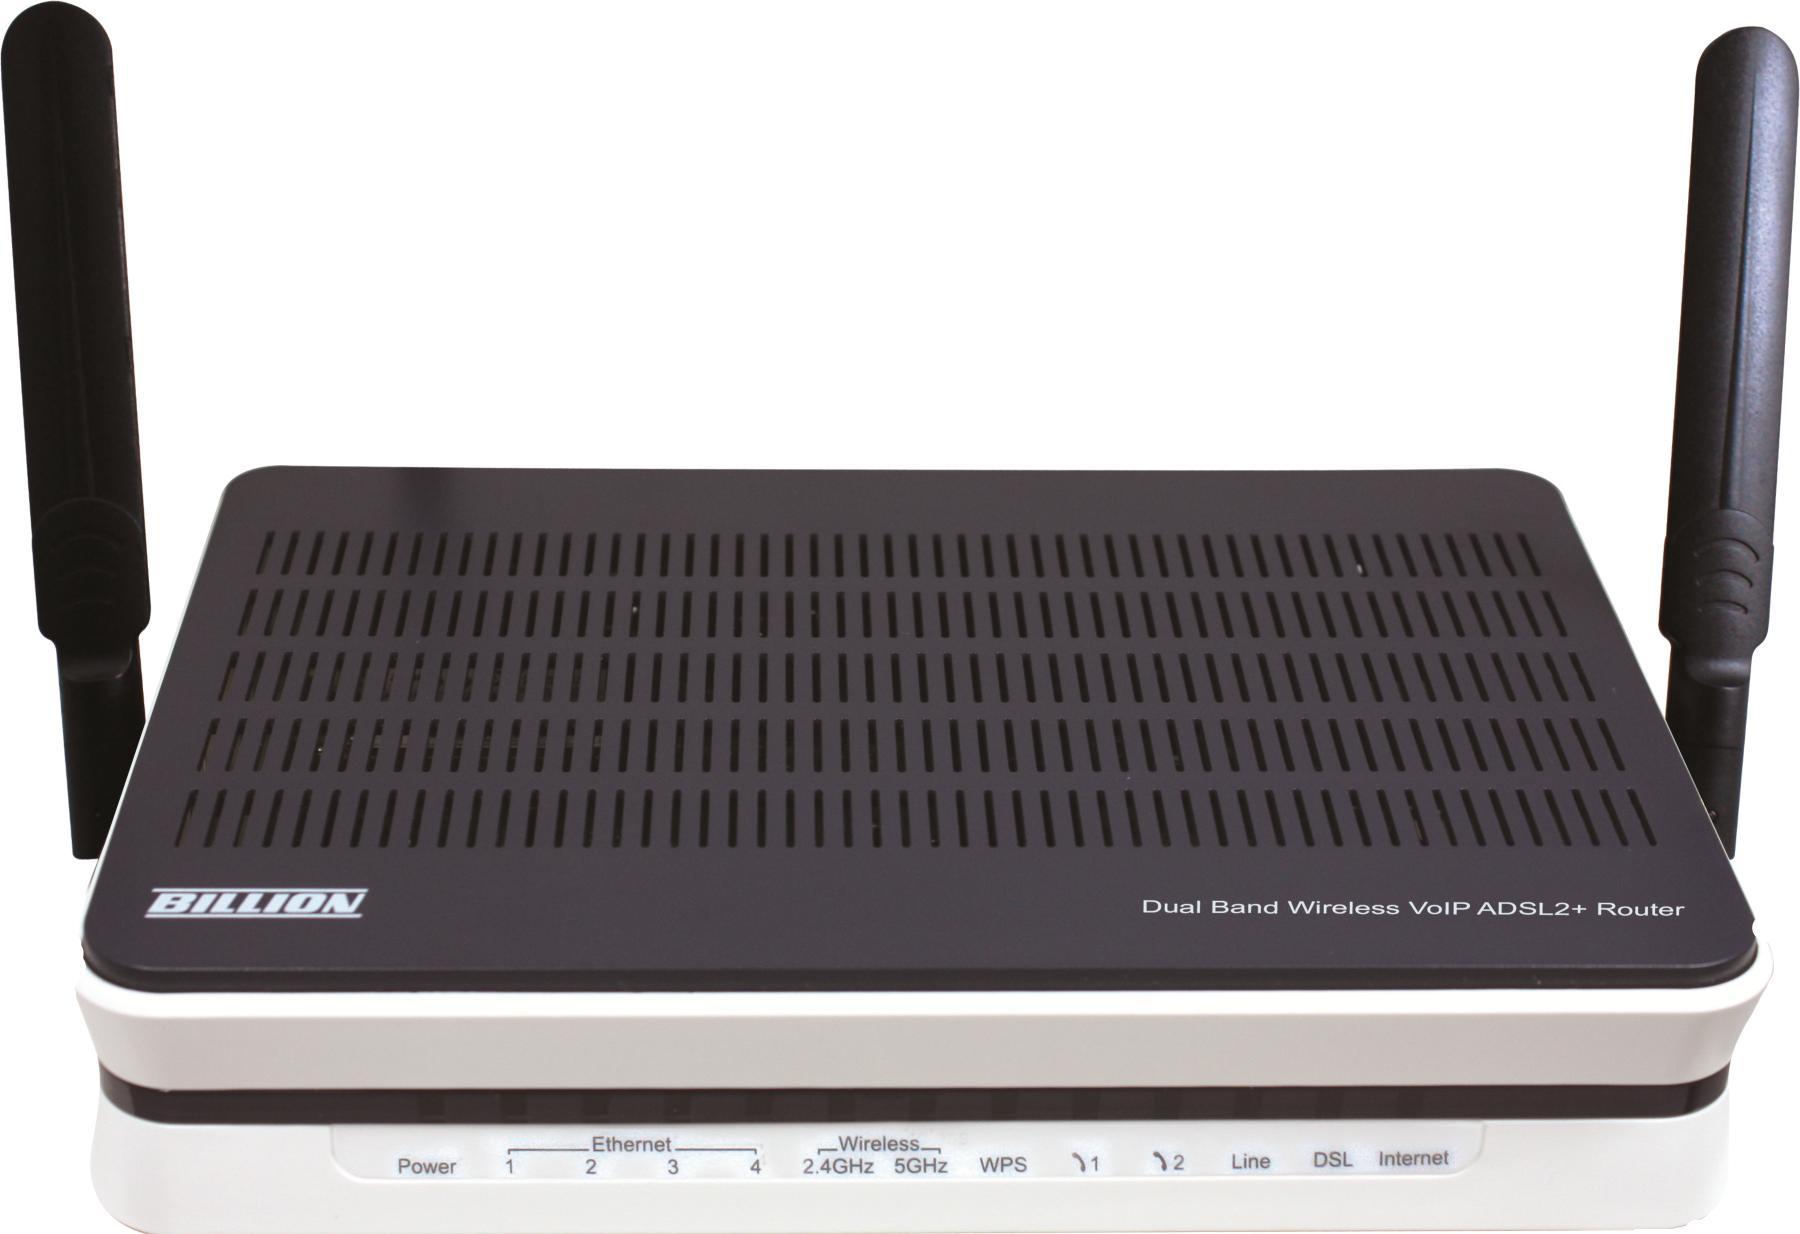 Billion BiPAC 7800VDOX